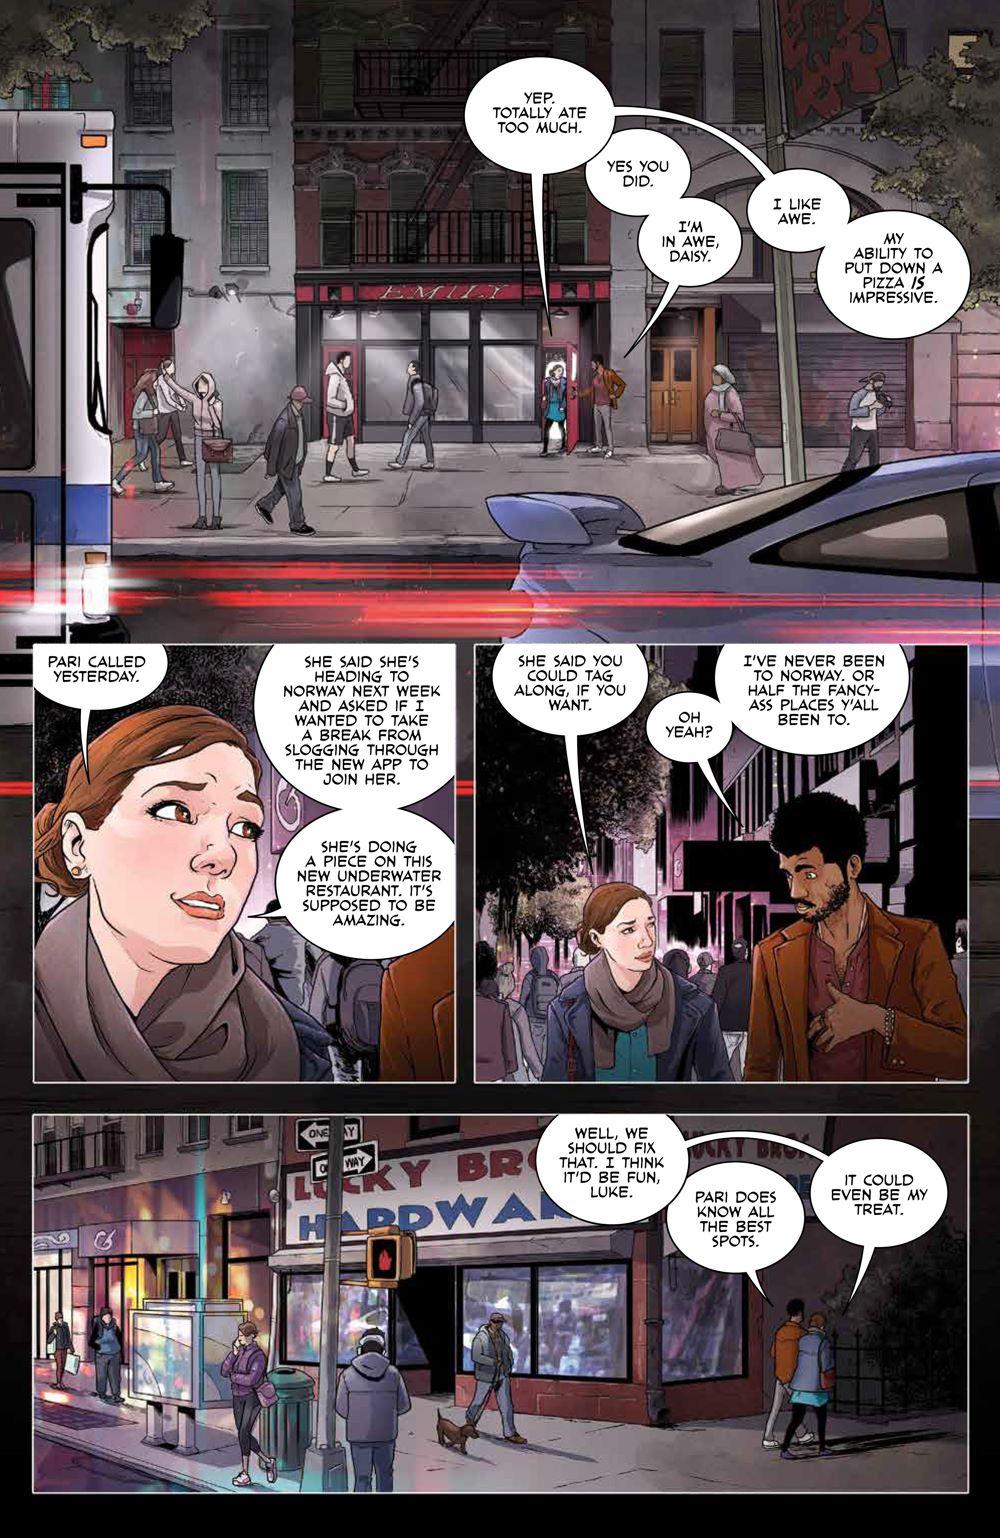 RedMother_v1_SC_PRESS_10 ComicList Previews: RED MOTHER VOLUME 1 TP